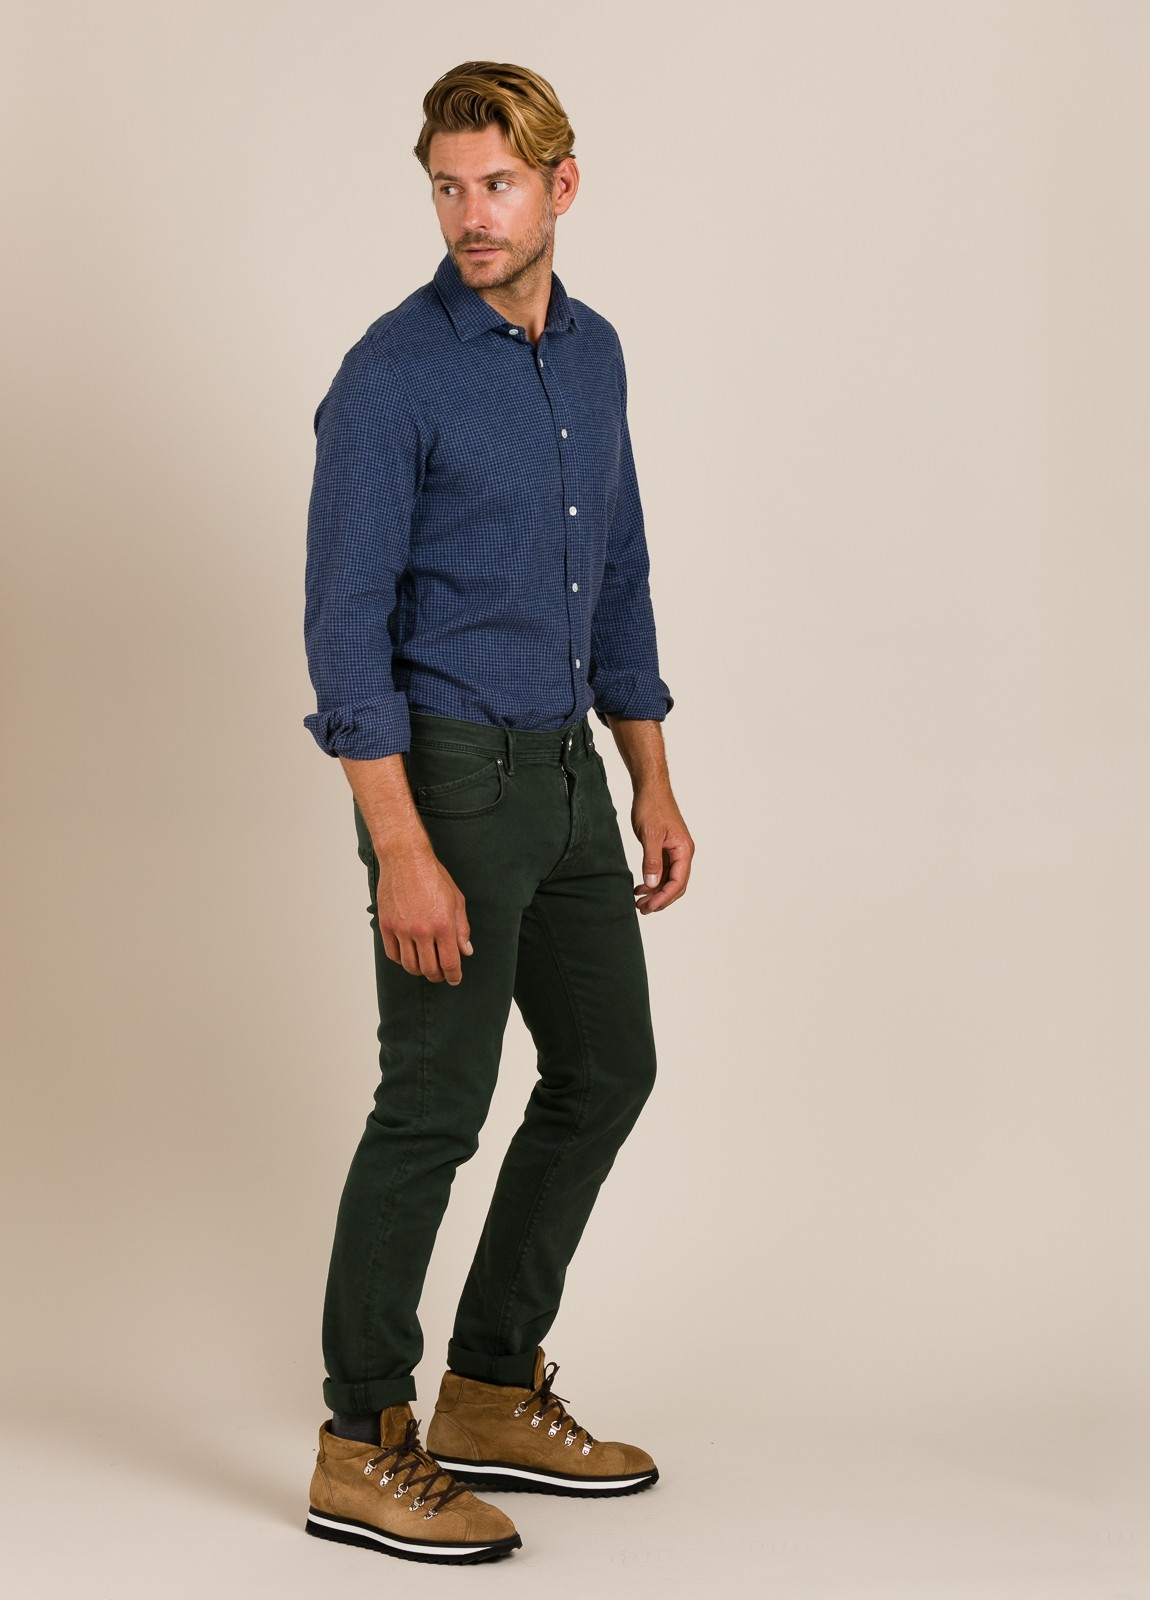 Camisa HARTFORD cuadros azul - Ítem1